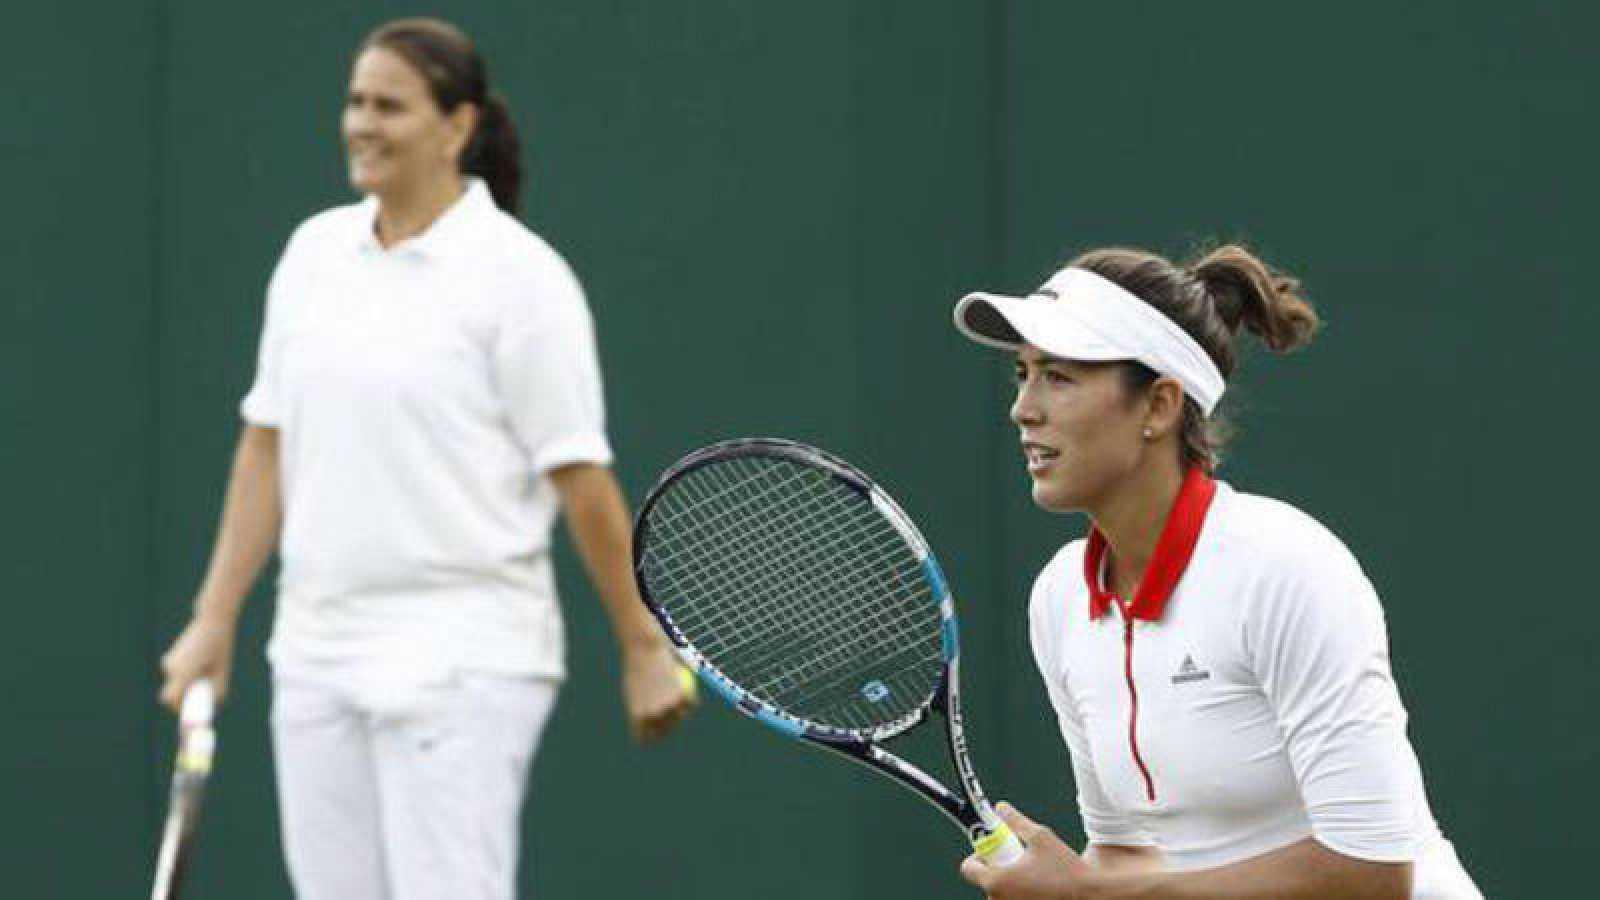 La tenista Garbiñe Muguruza entrena bajo la atenta mirada de su entrenadora Conchita Martínez.